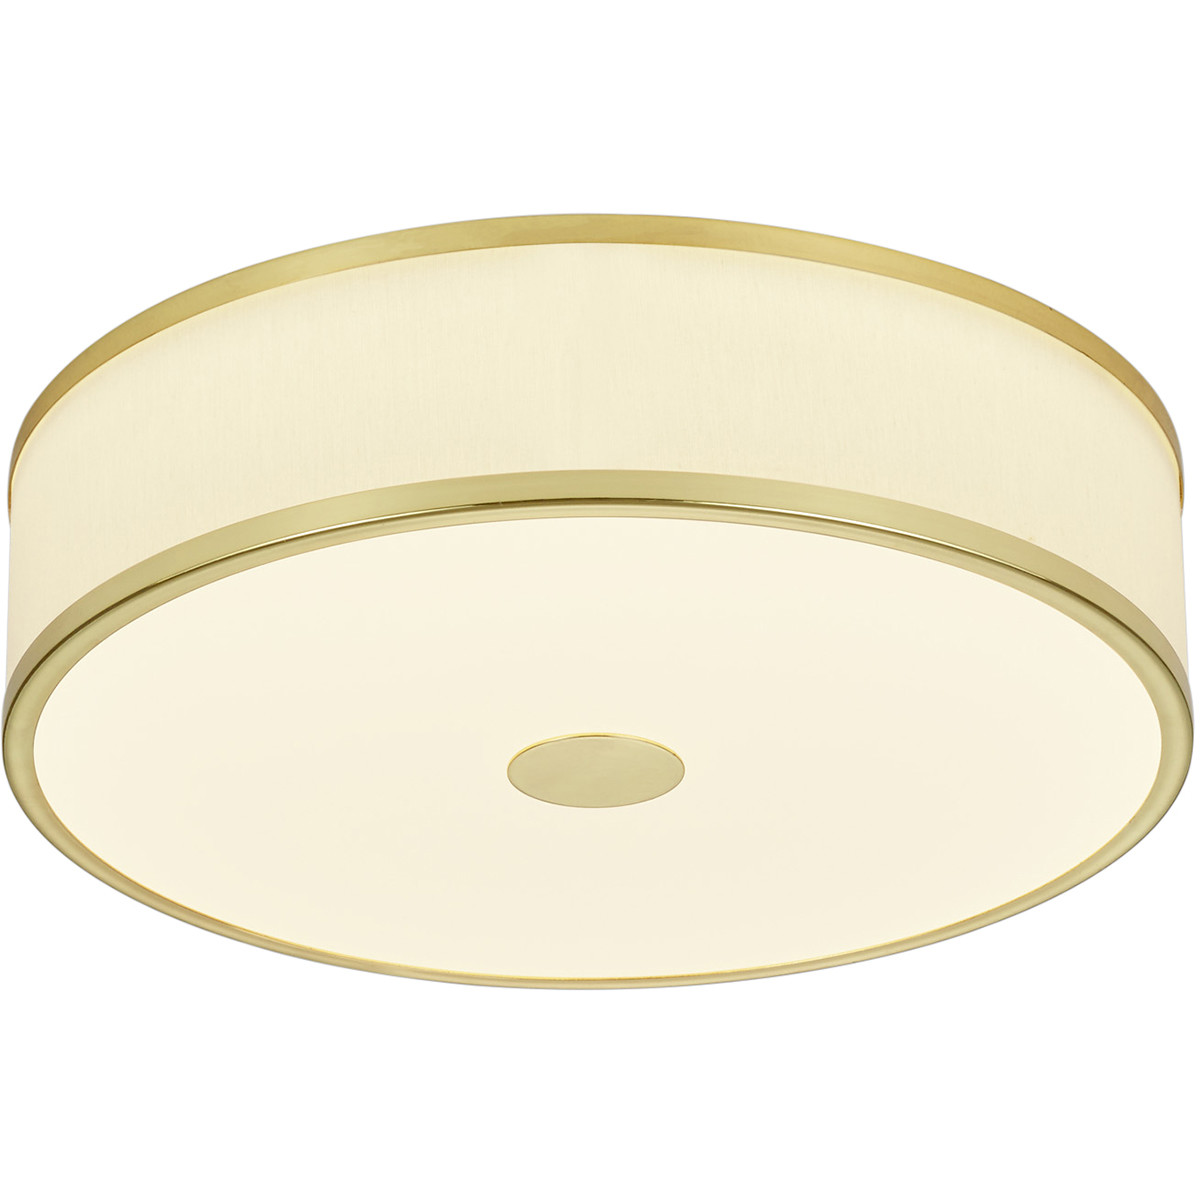 LED Plafondlamp - Trion Agiany - Opbouw Rond - 24W - Dimbaar - Warm Wit 3000K - Mat Goud - Aluminium